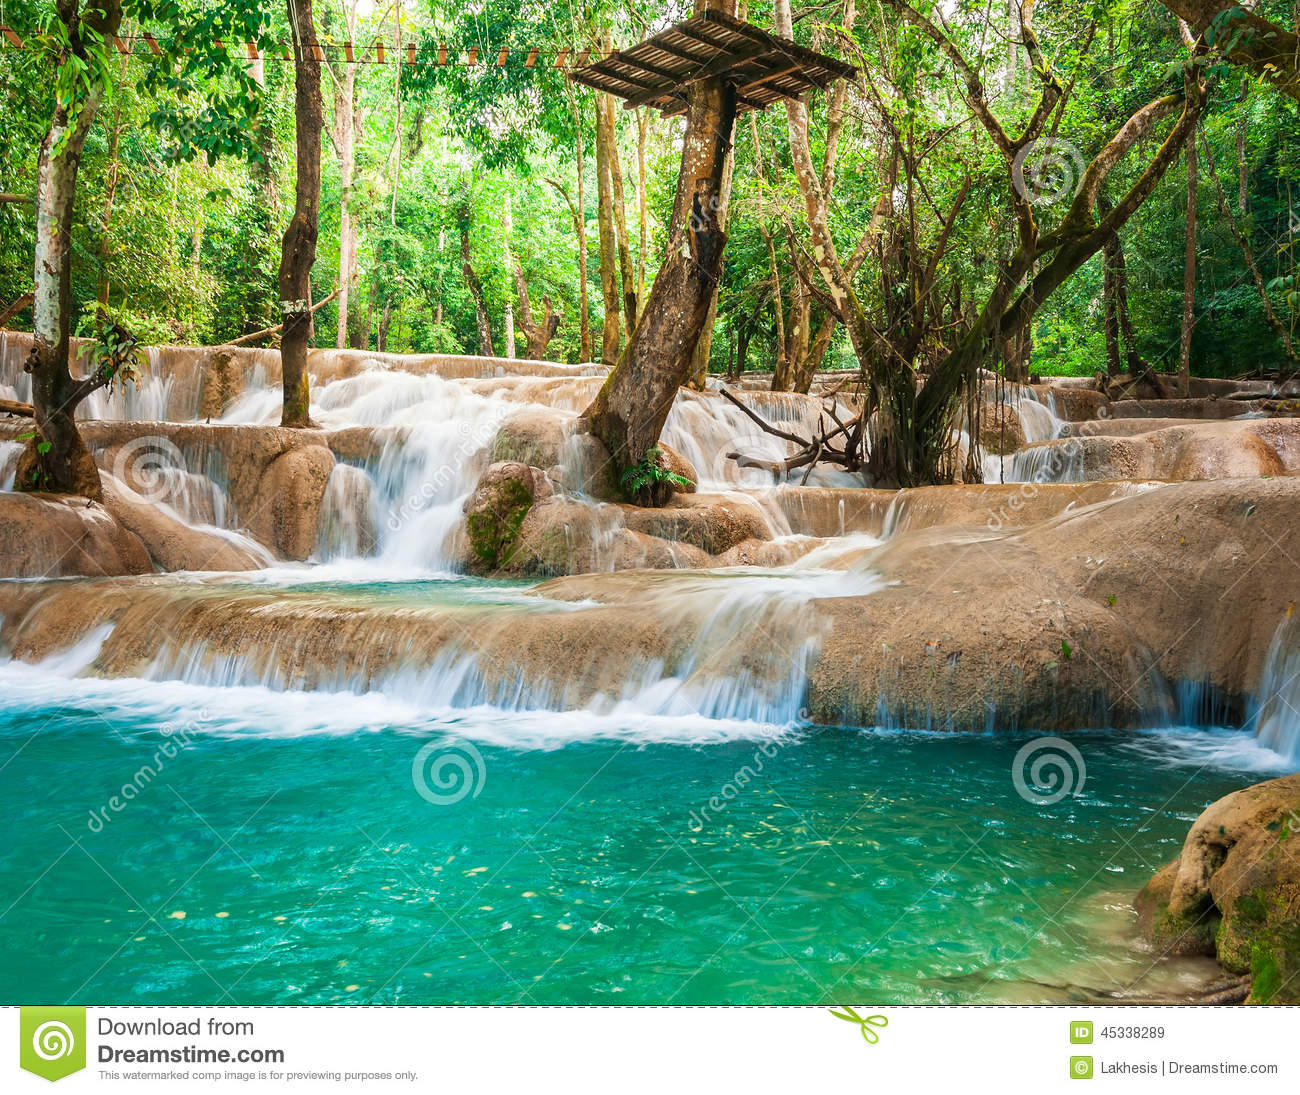 Kuang Si Waterfall clipart #2, Download drawings